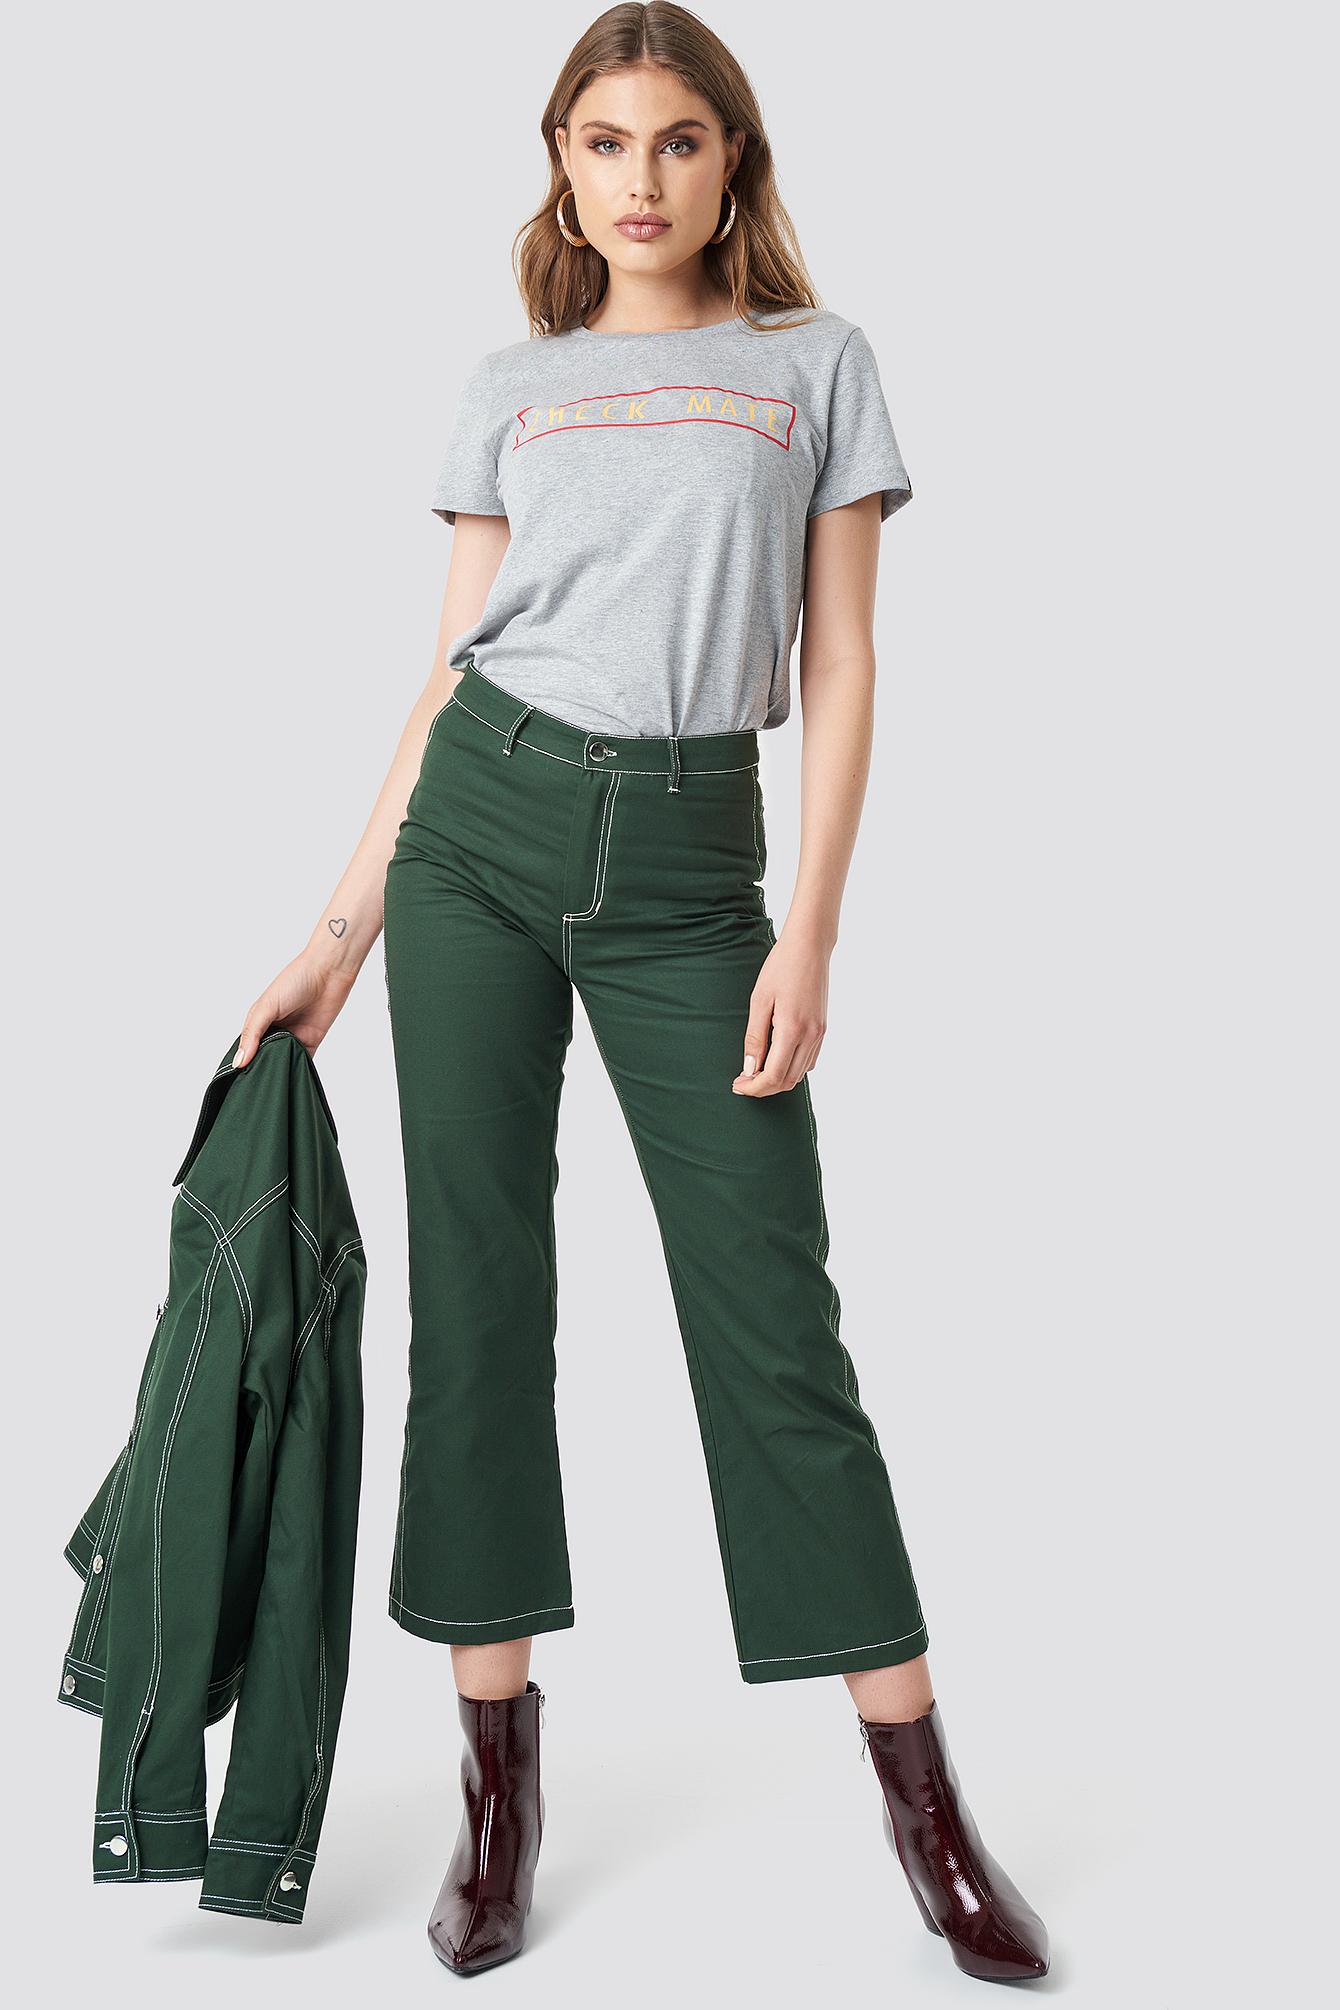 Misanda Pants NA-KD.COM